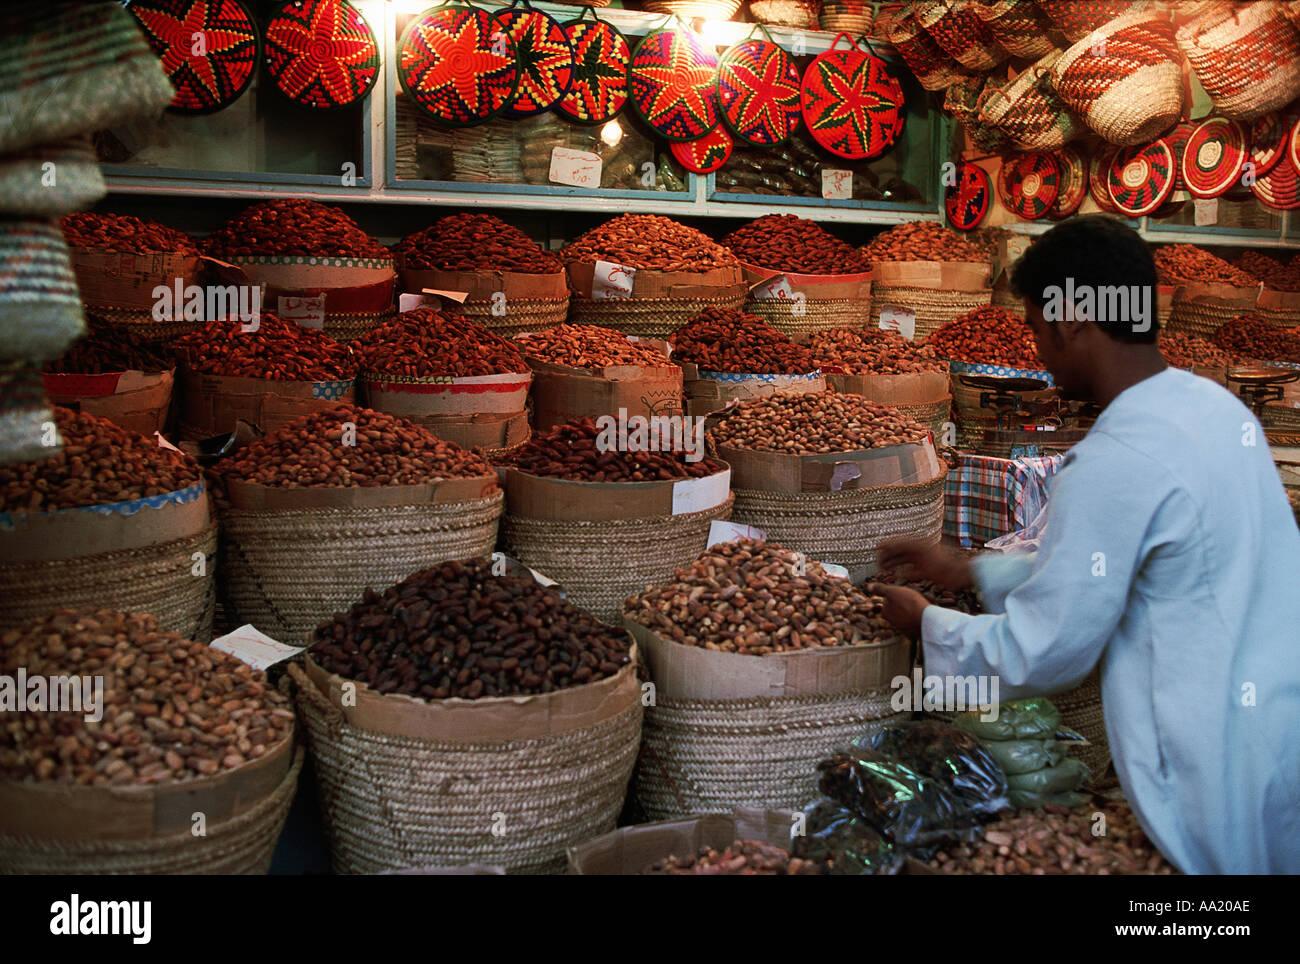 Egypt Assouan Souk - Stock Image